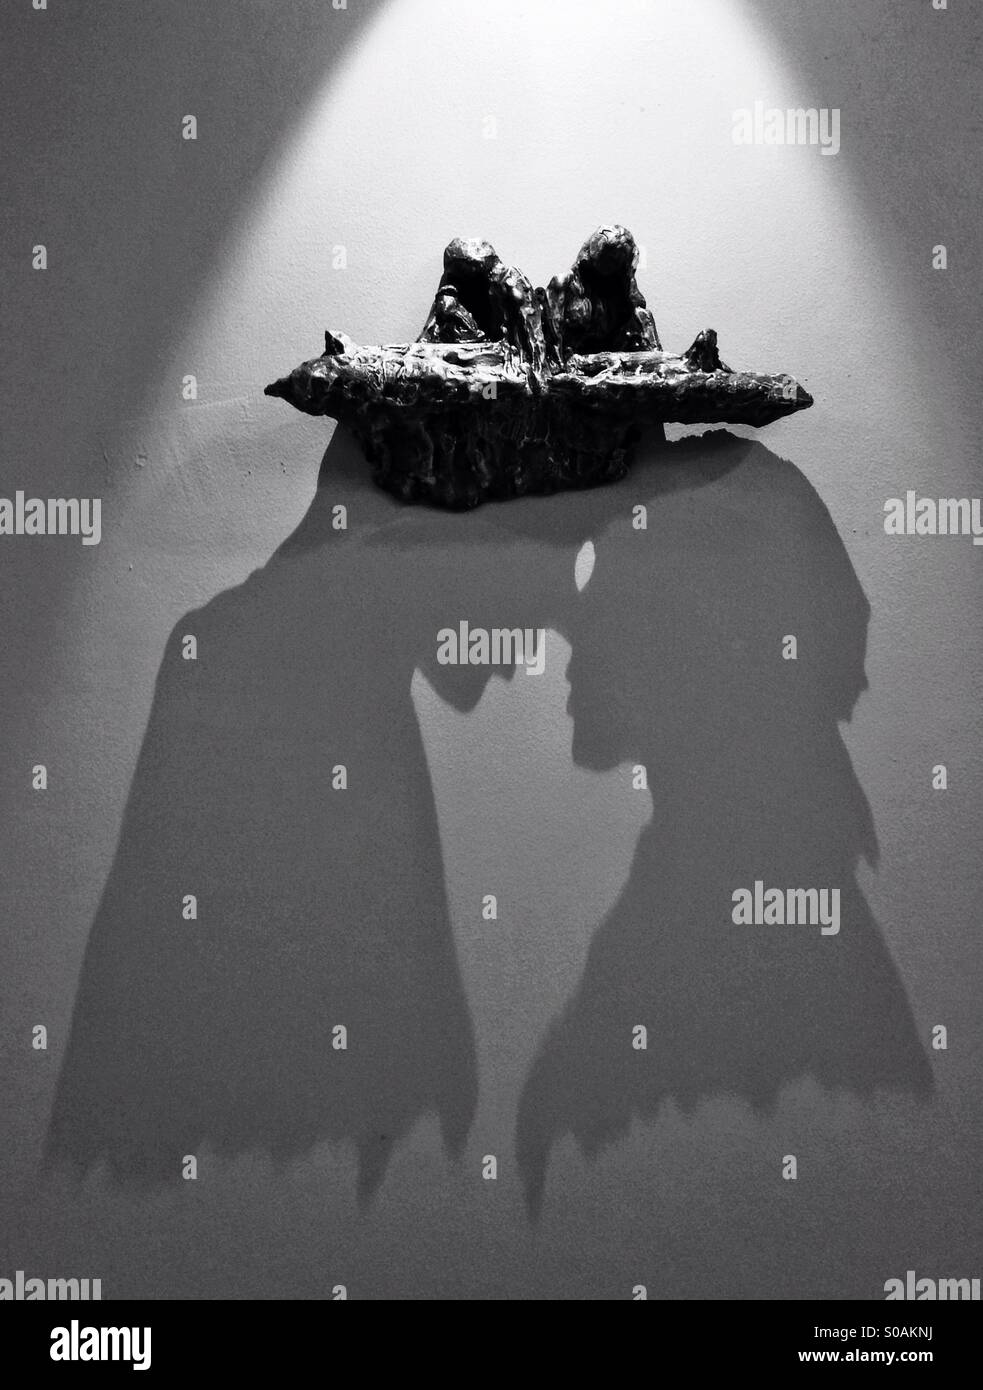 Shadow Art - Stock Image